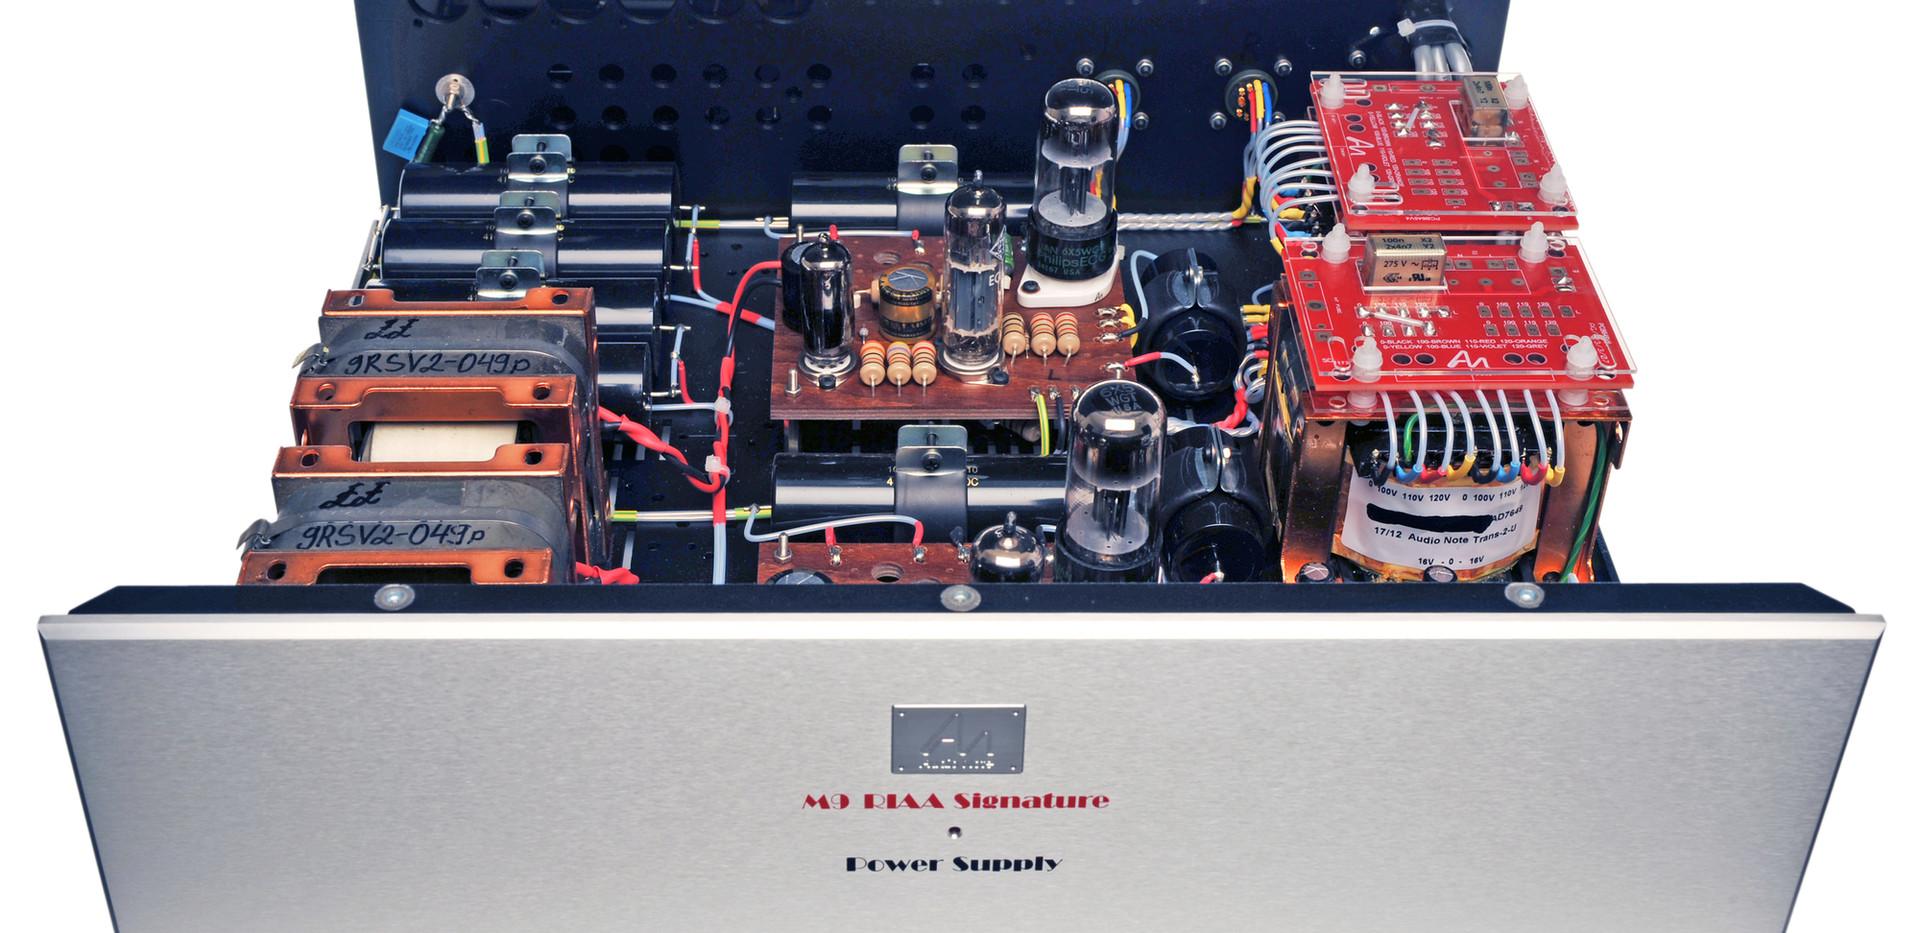 M9 RIAA Sig PSU front top off edit 1.jpg